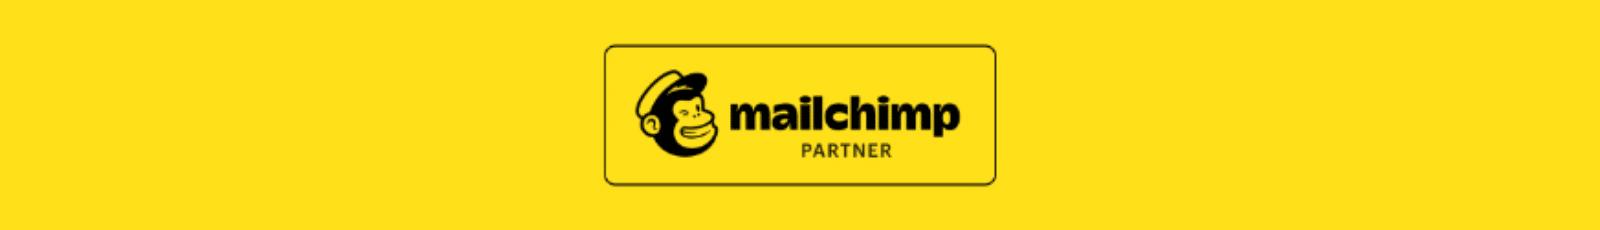 Mailchimp Free